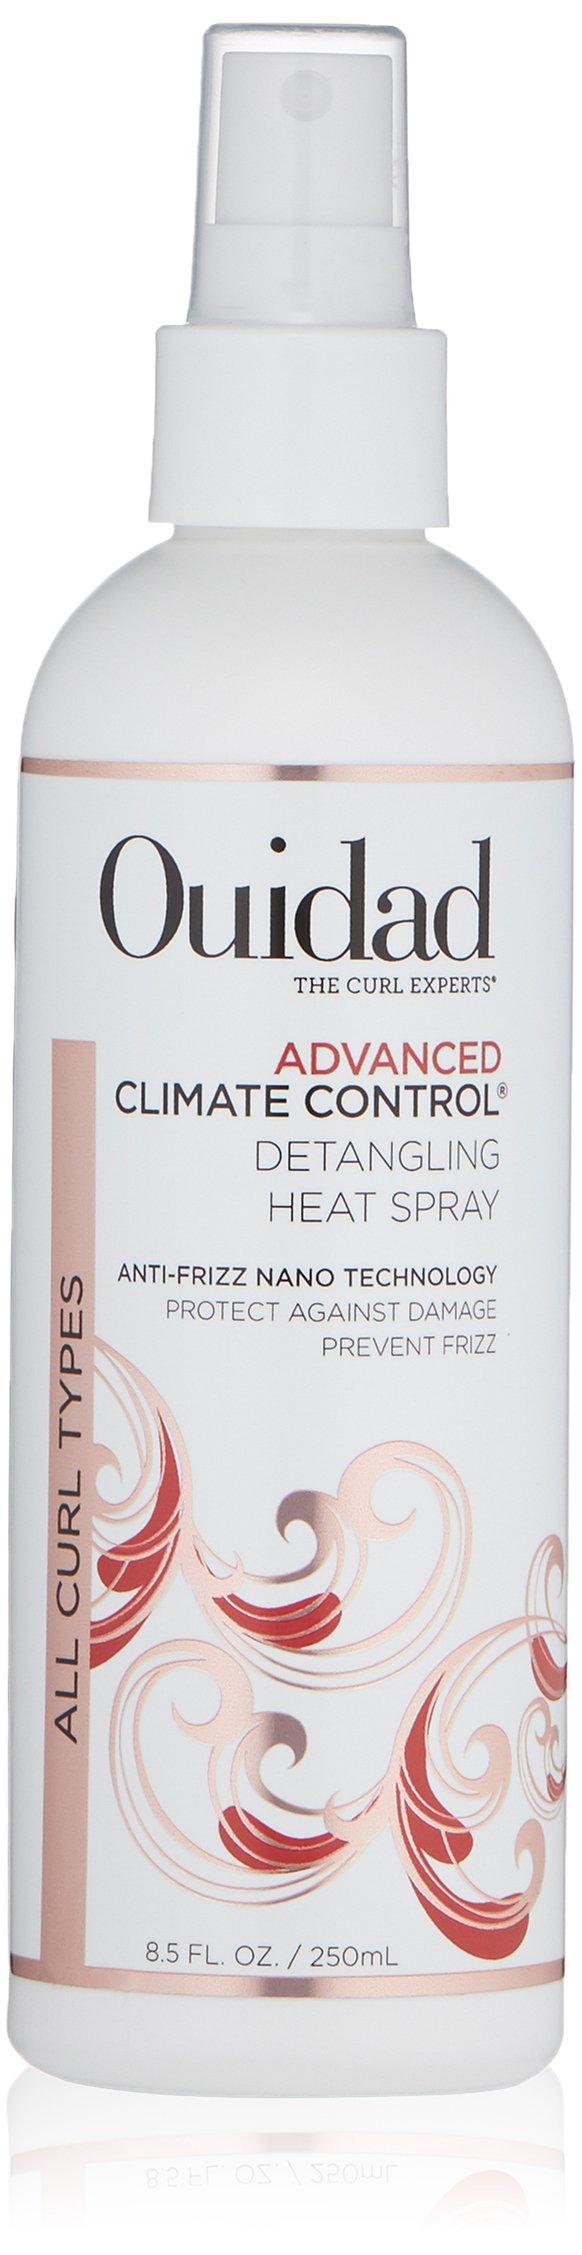 OUIDAD Advanced Climate Control Detangling Spray, 8.5 Fl Oz